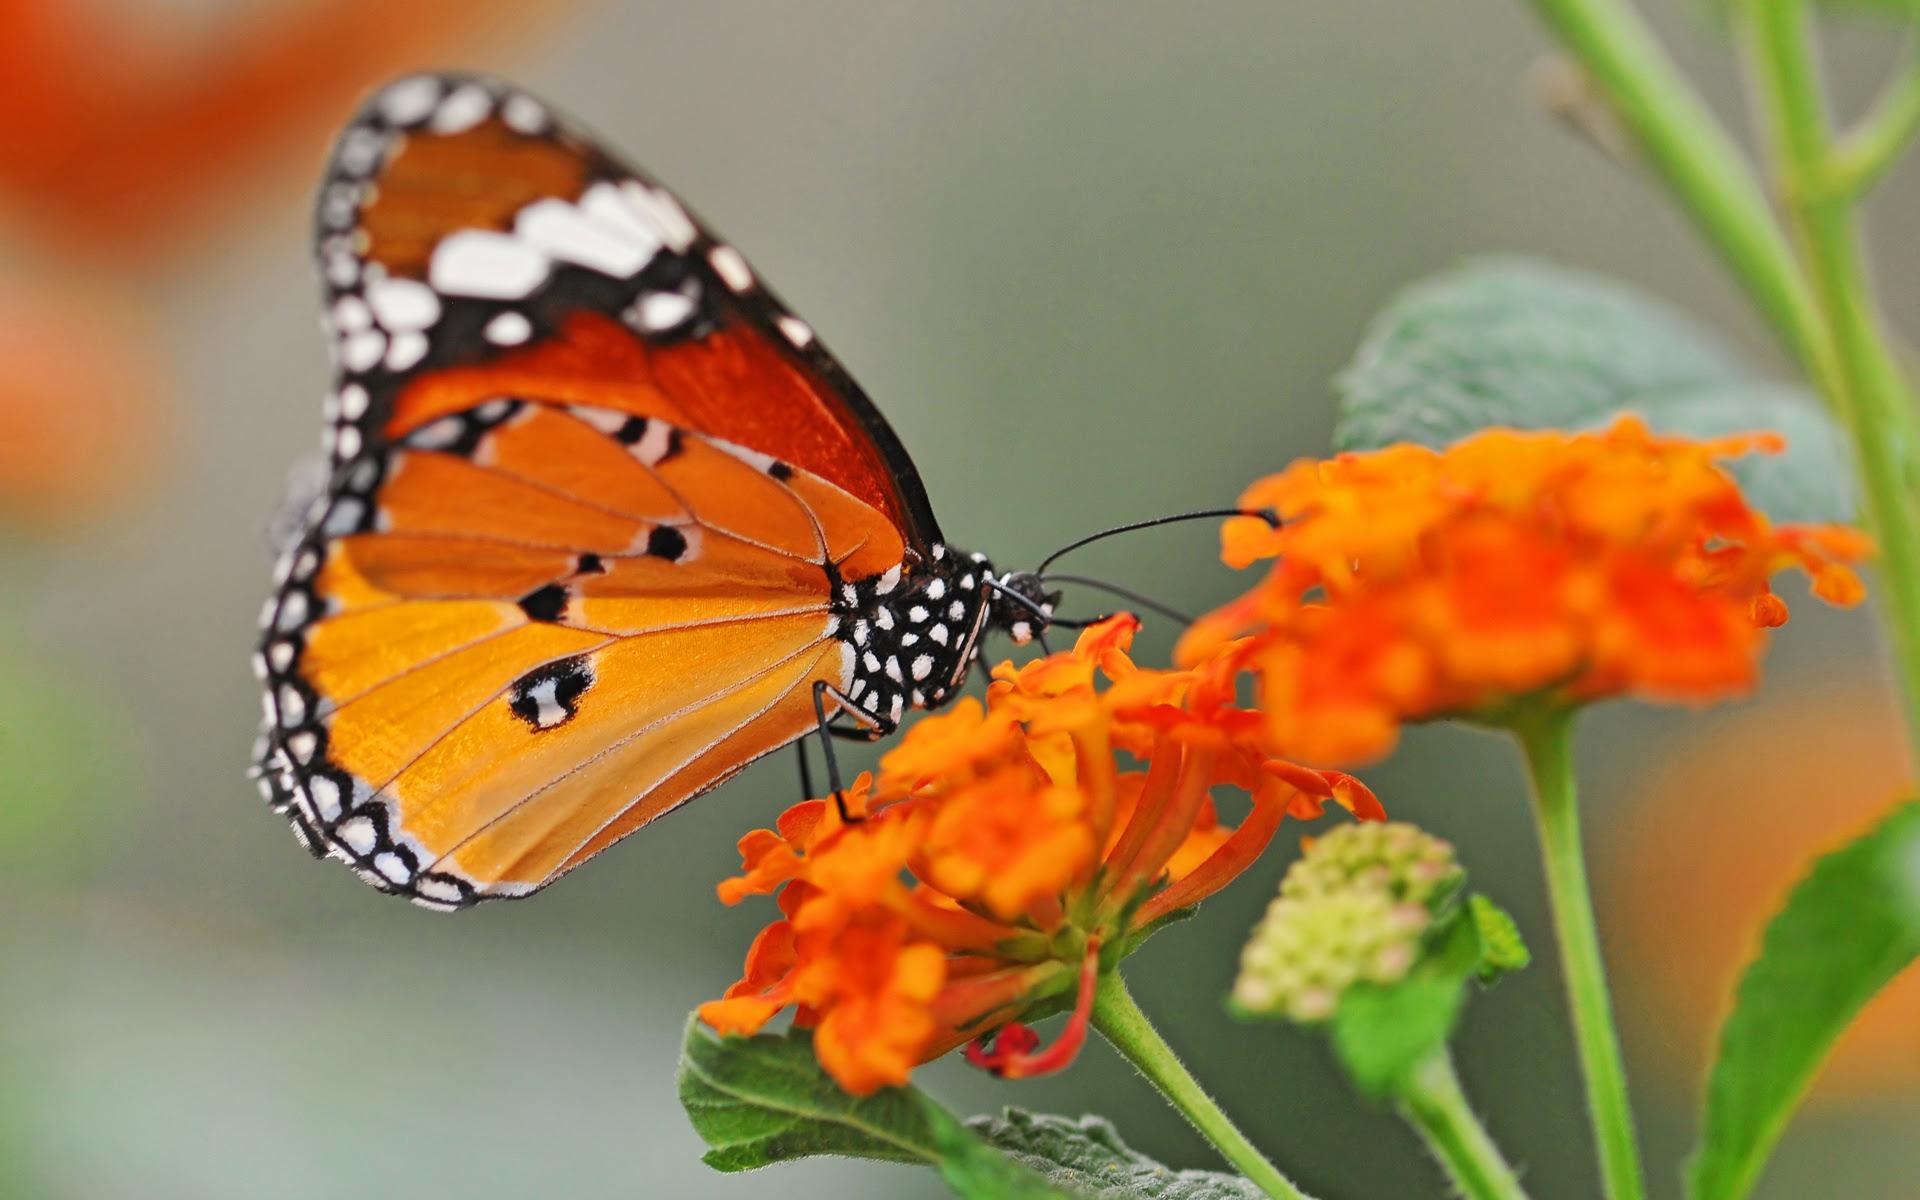 Free Desktop Wallpaper Butterflies Flowers - WallpaperSafari